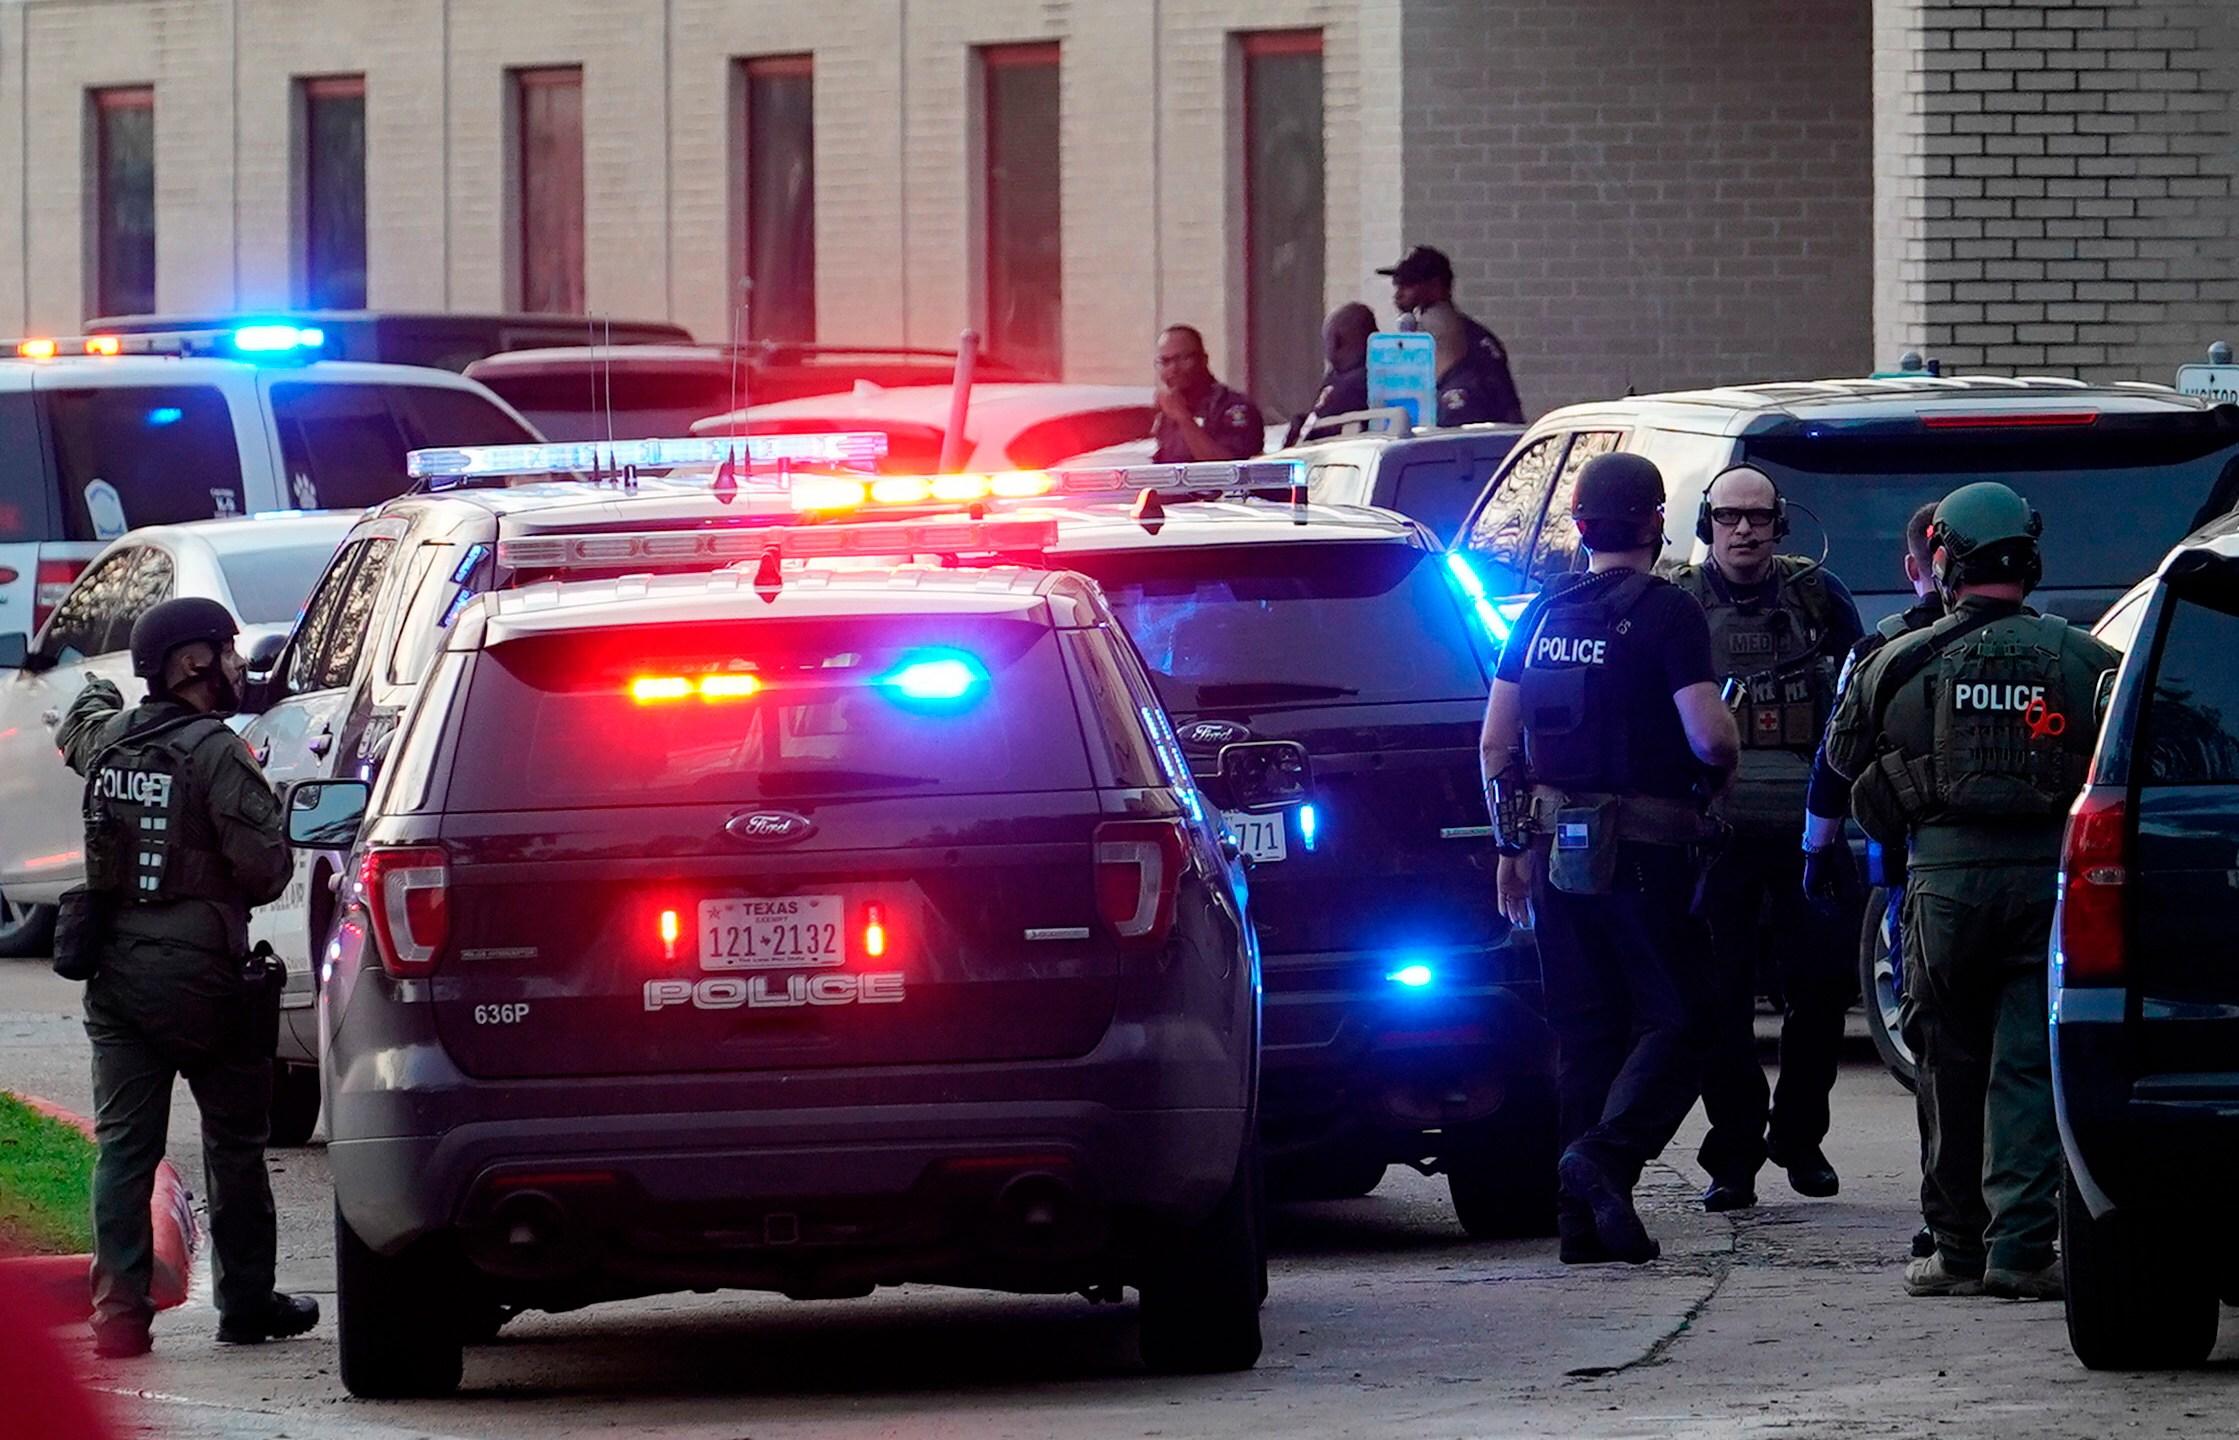 Ass Traffic Teen kent state graduate's gun-toting photo goes viral